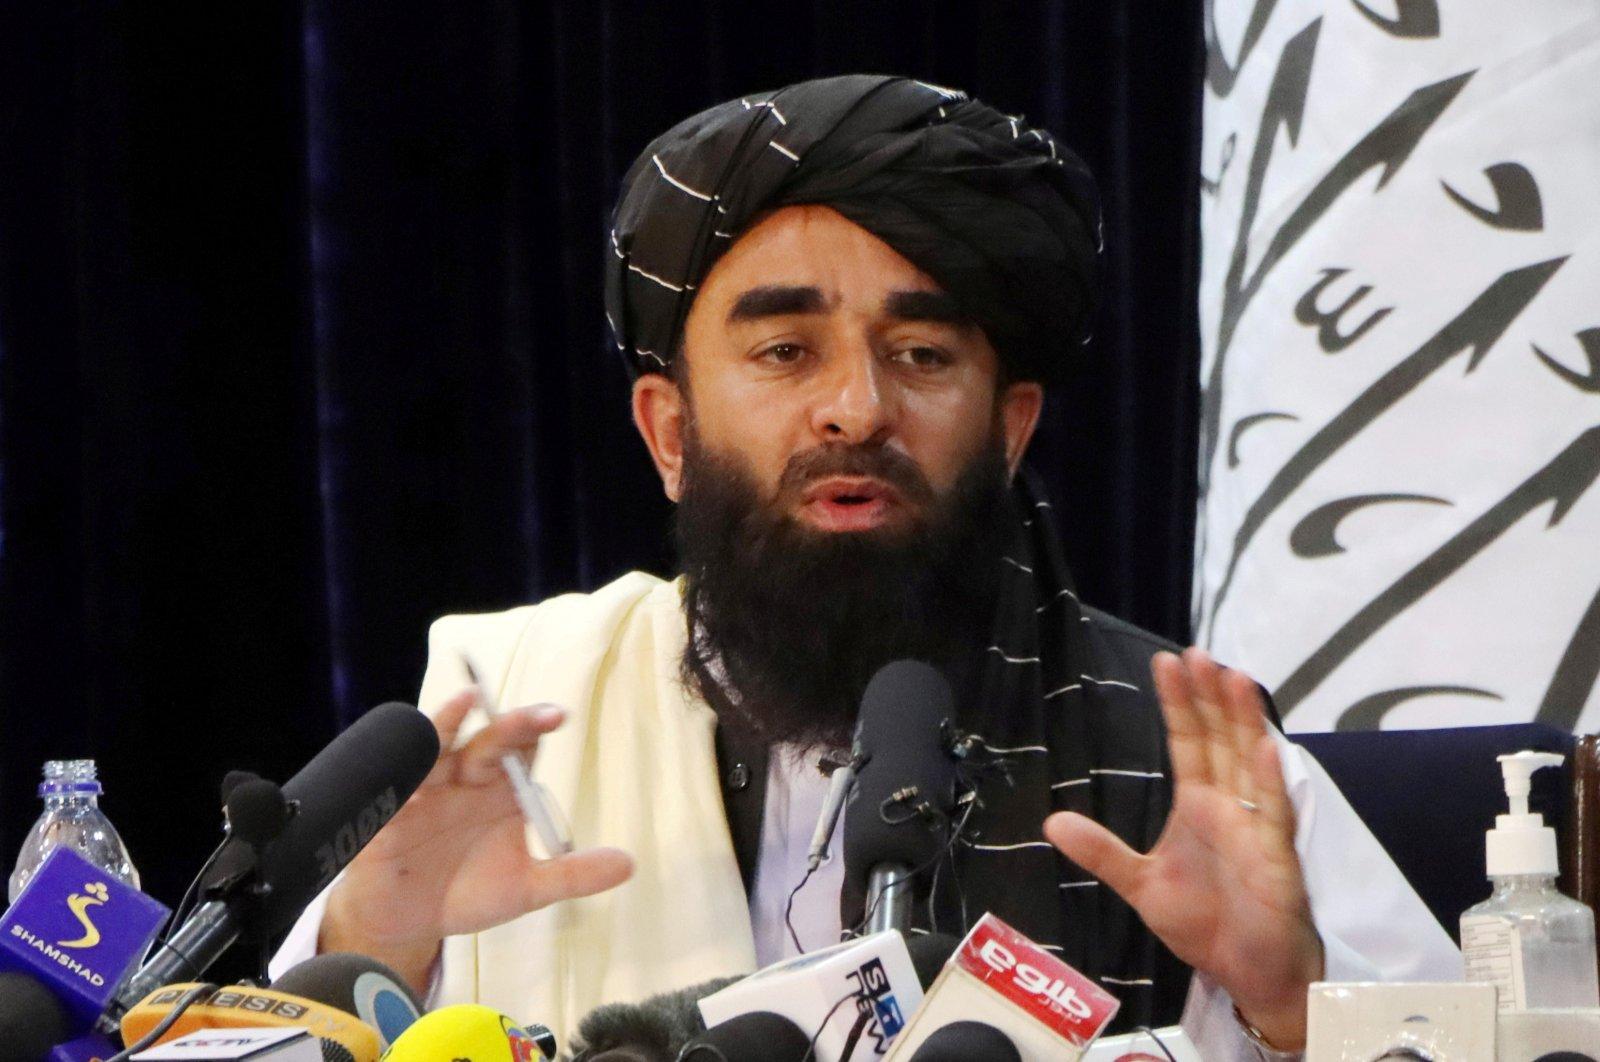 Taliban spokesman Zabihullah Mujahid speaks during a news conference in Kabul, Afghanistan, Aug. 17, 2021. (Reuters Photo)